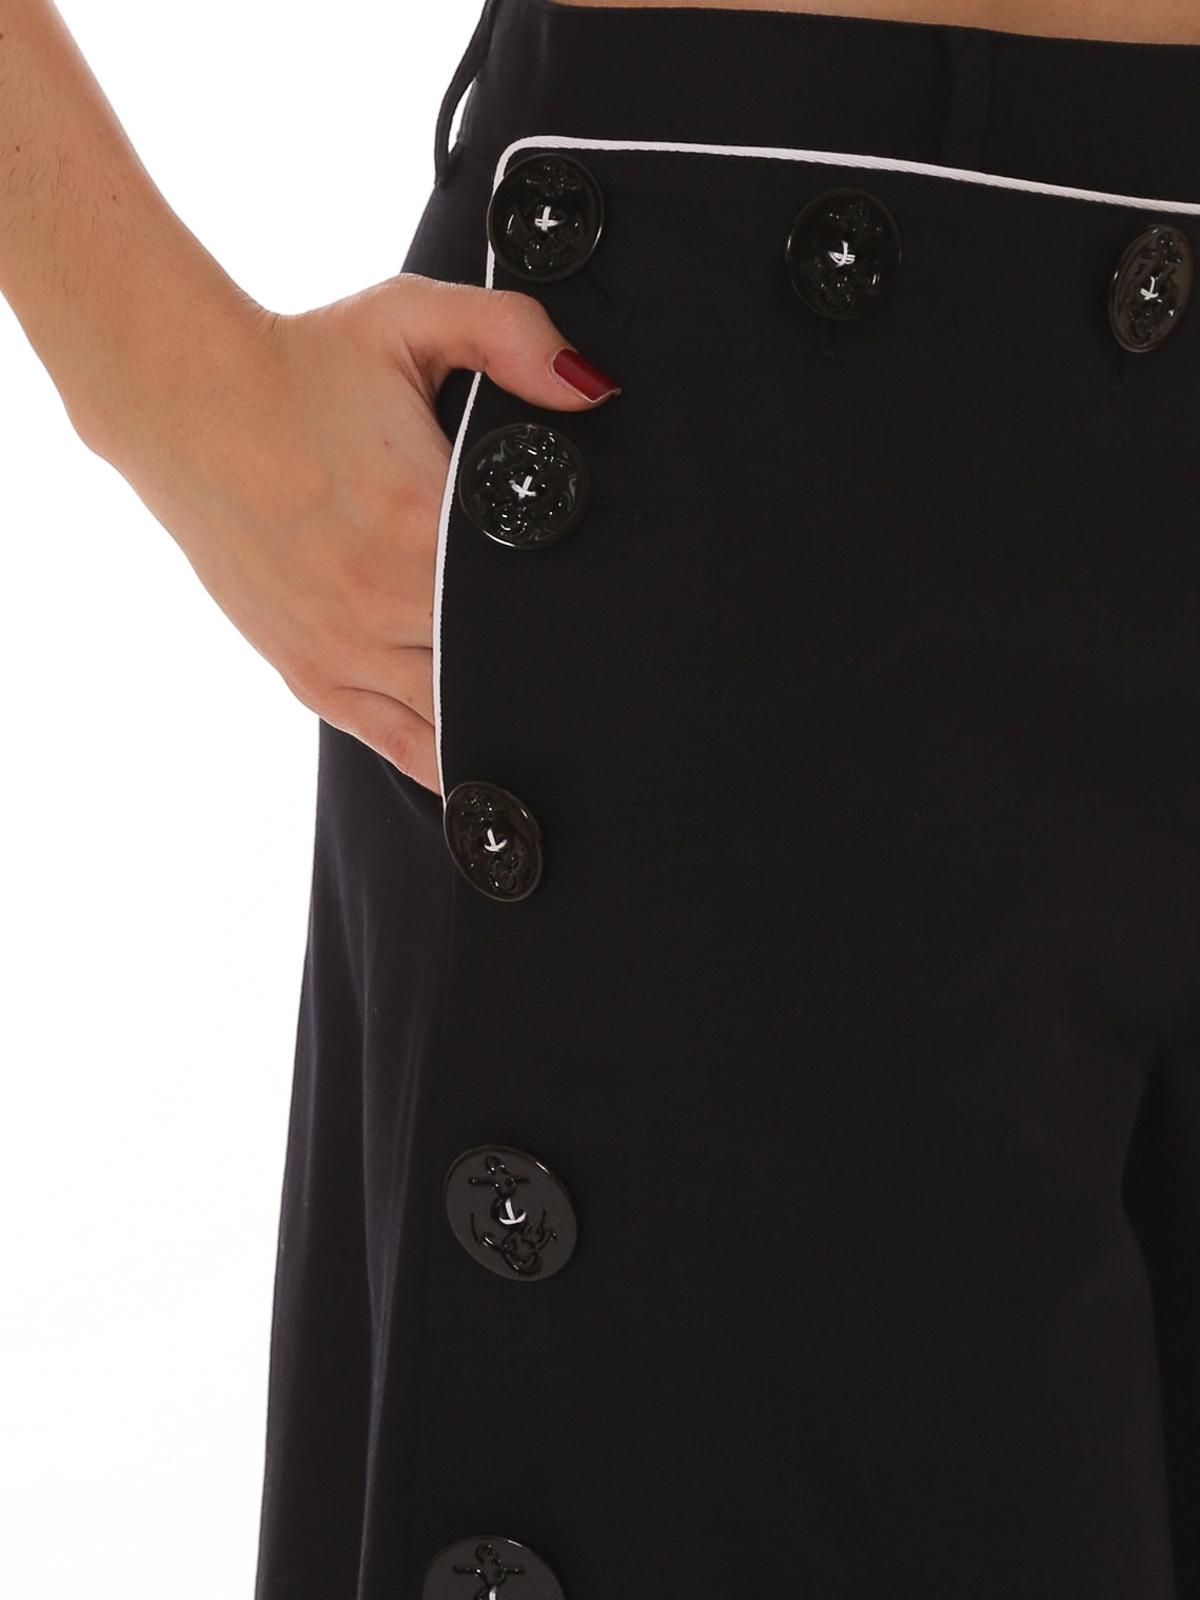 best loved 847ae c3e32 Dolce & Gabbana - Pantalone corto in stile marinaro ...